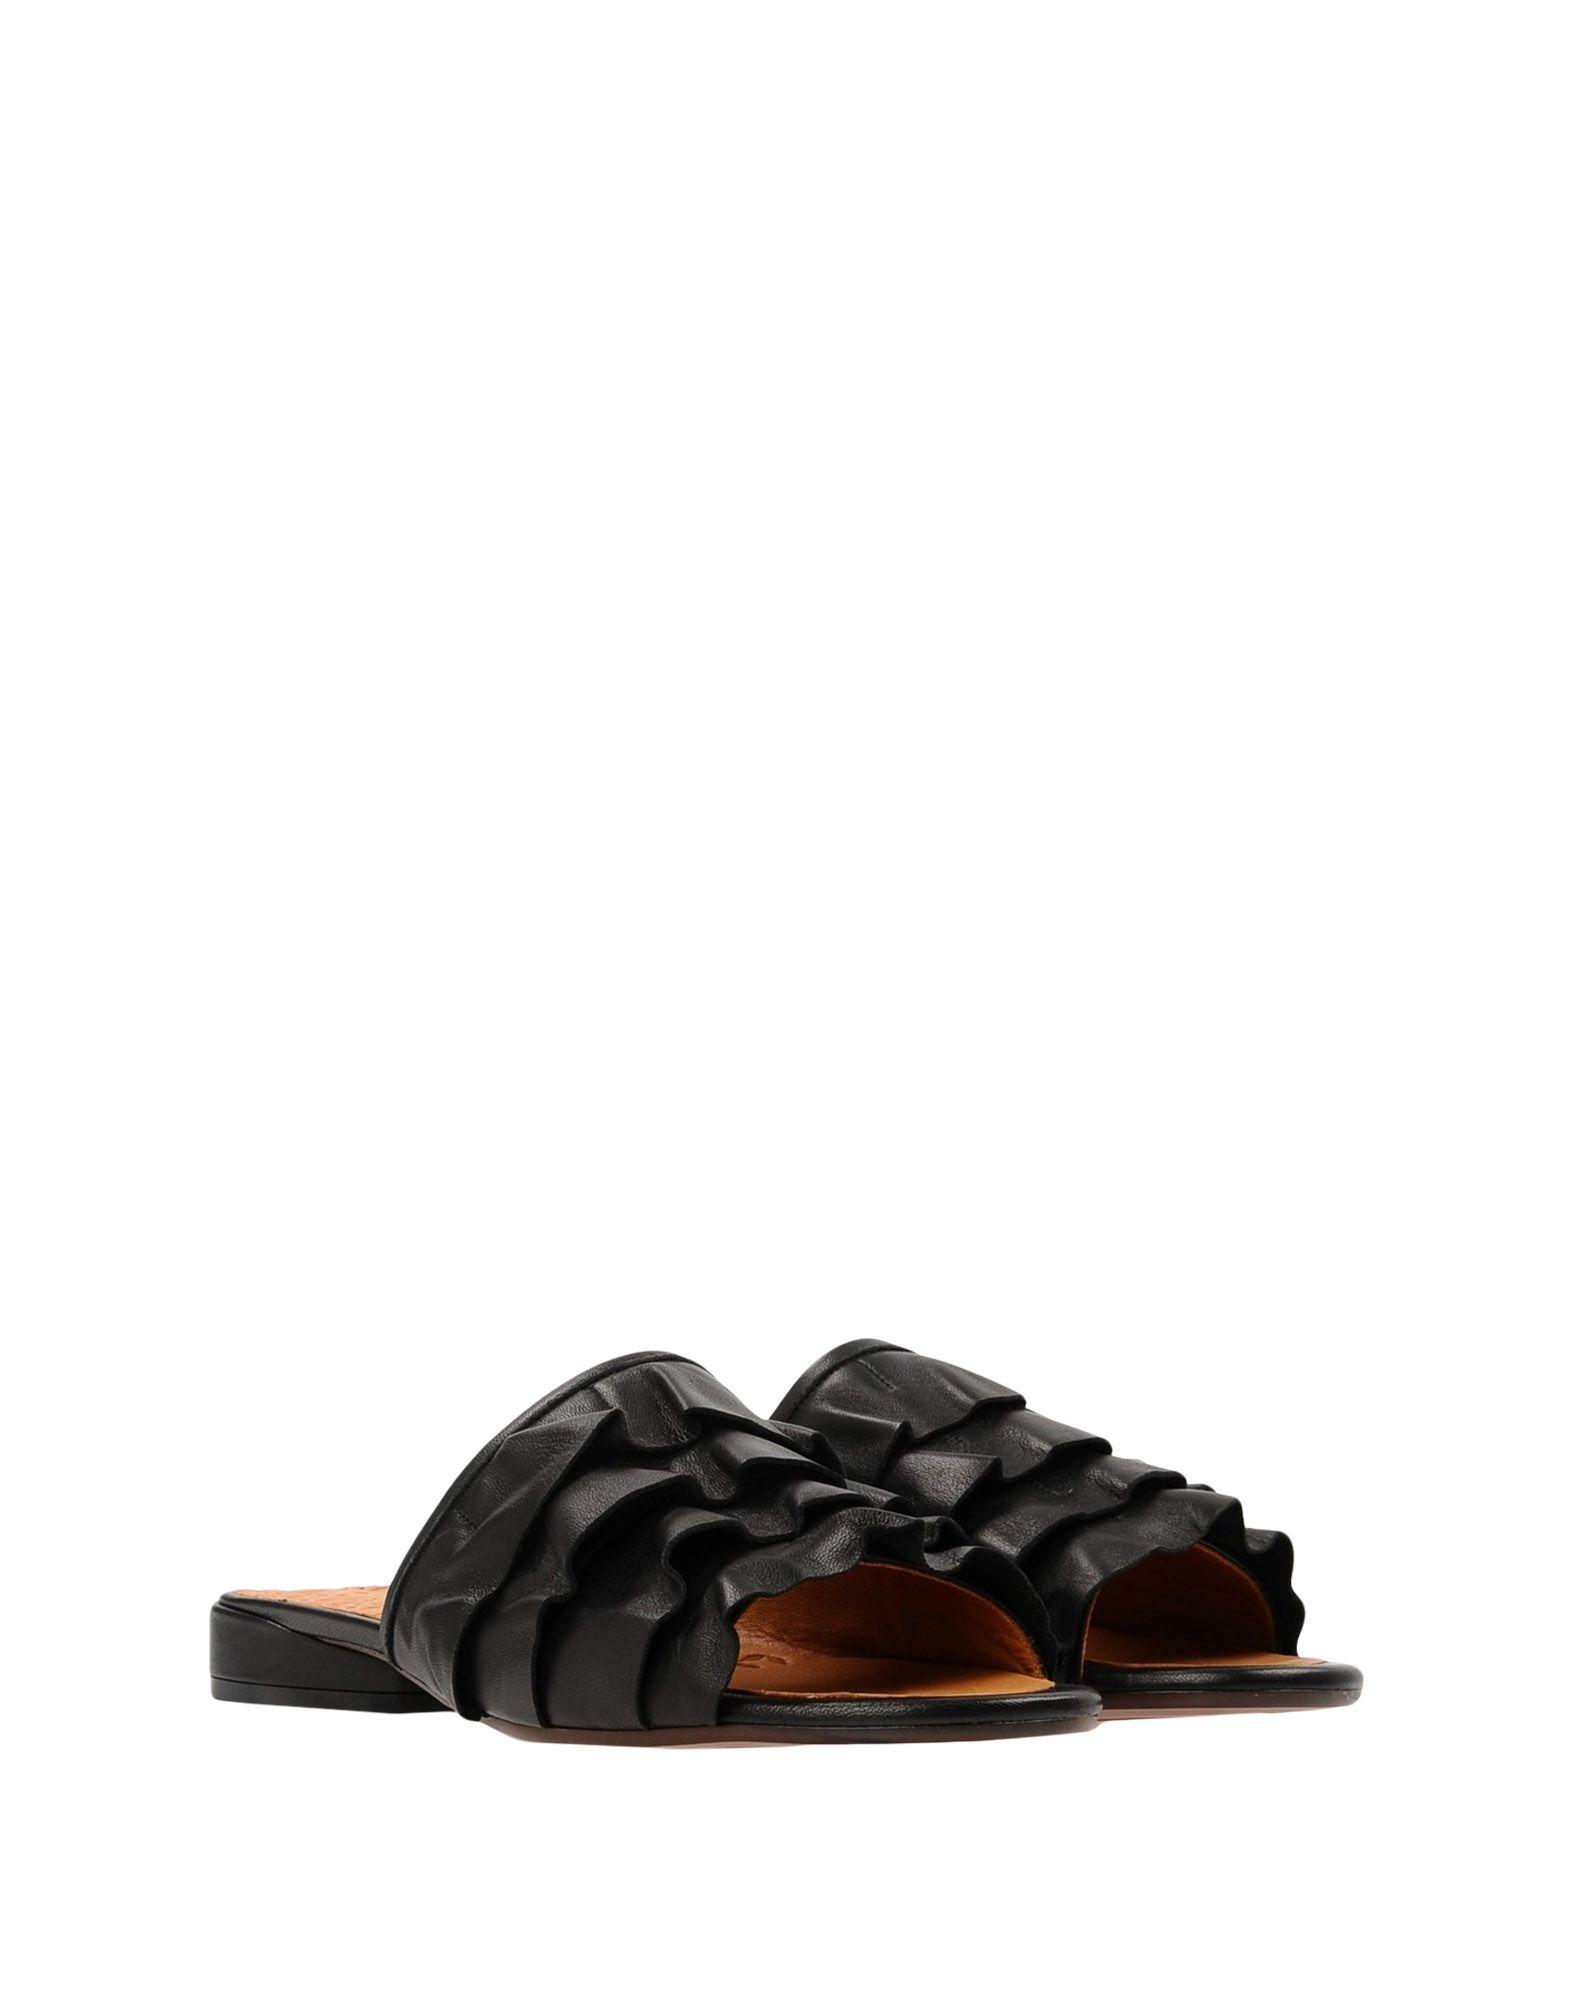 Sandales Chie Mihara Volante - Femme - Sandales Chie Mihara sur